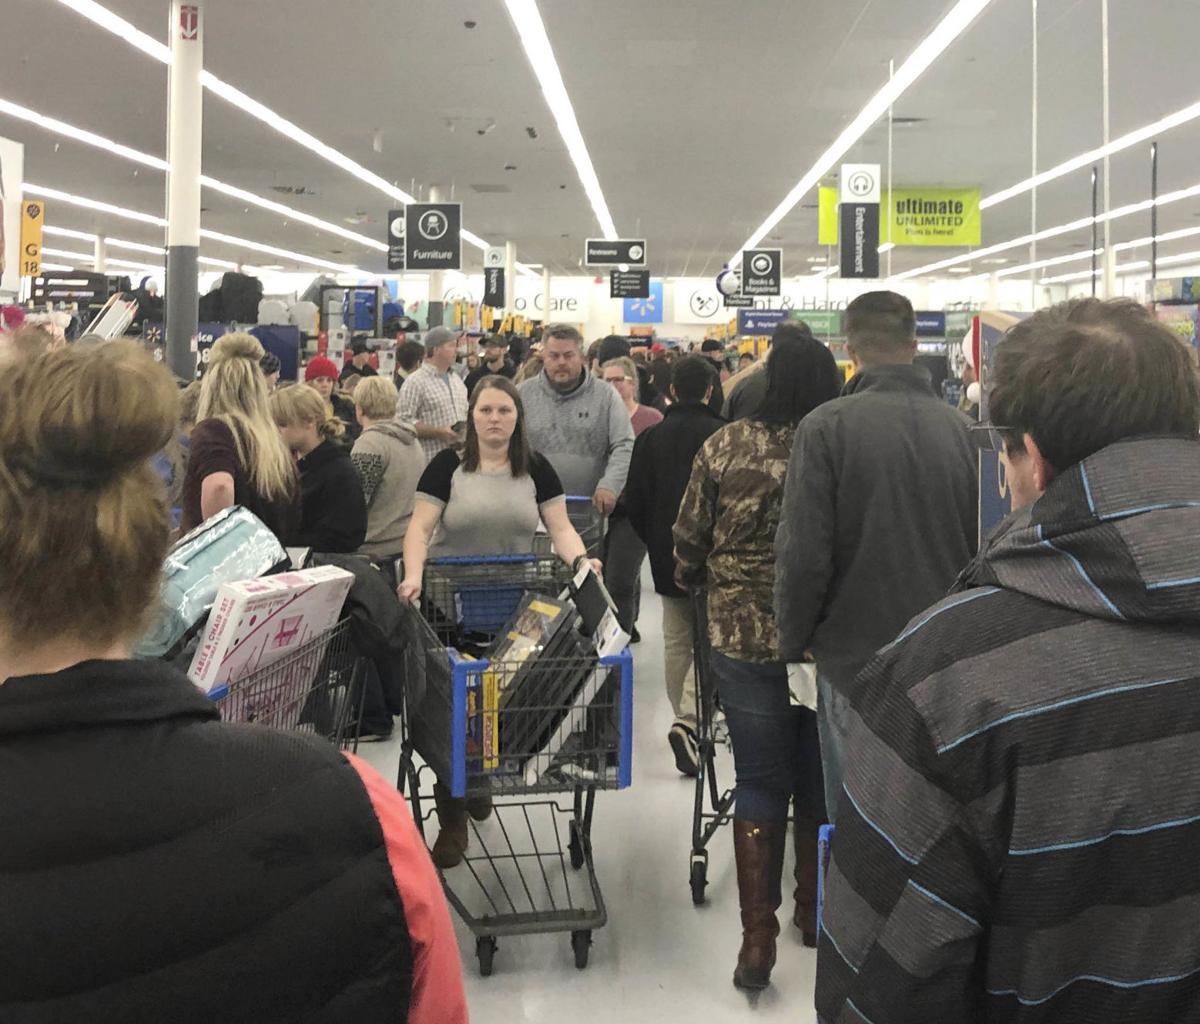 Racing Around Retail Black Friday Still Popular But Online Shopping Catching Up News Fergusfallsjournal Com